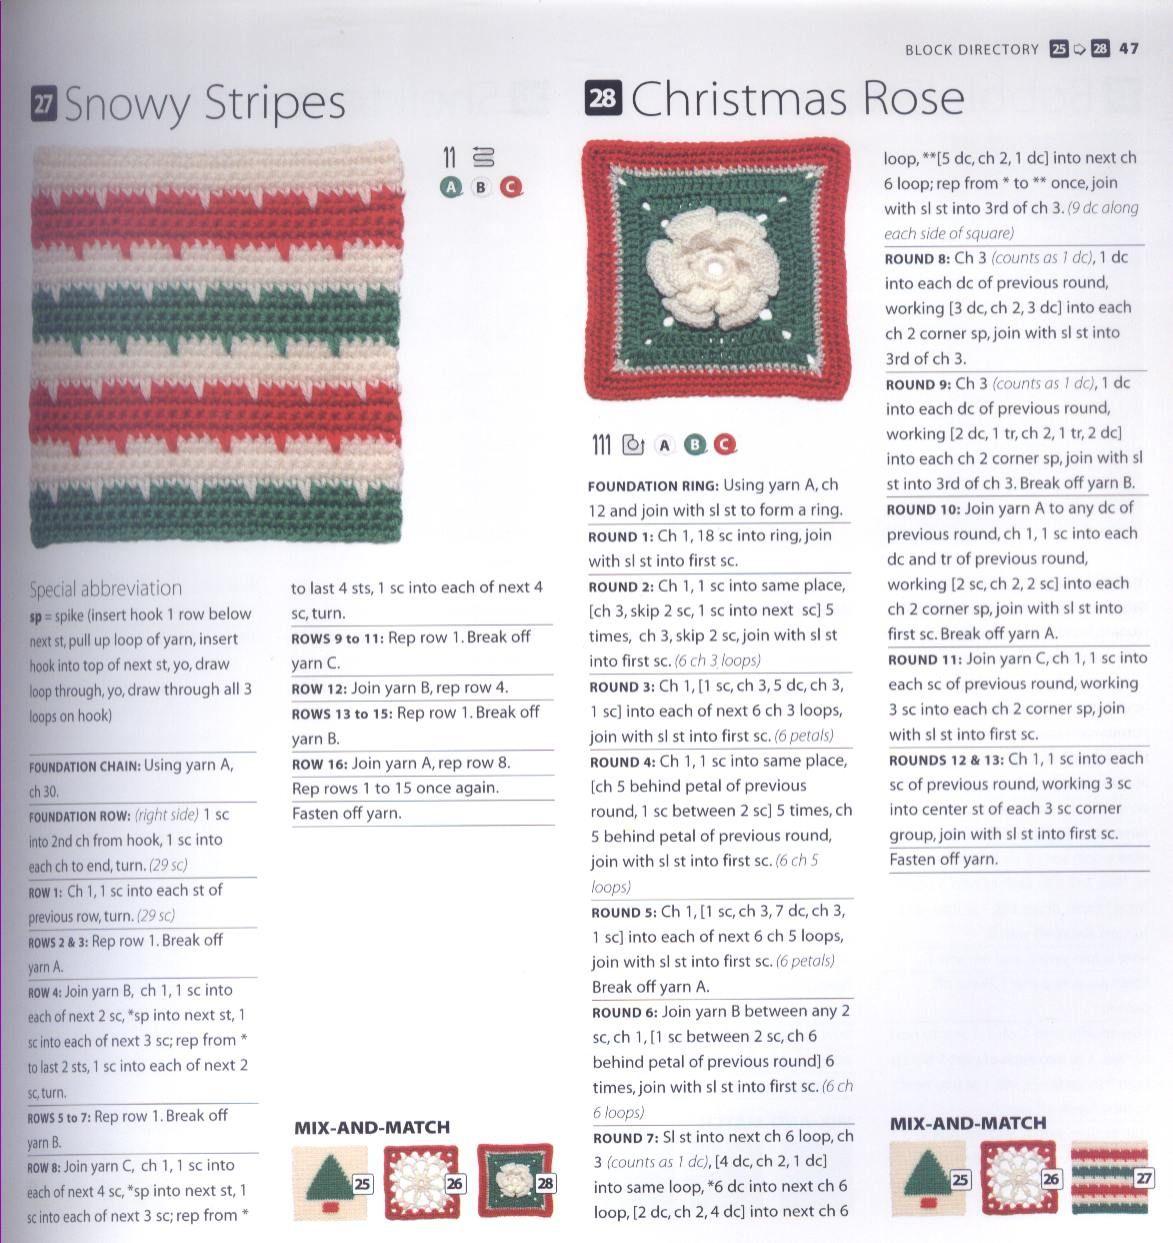 200 Crocheted Blocks for blankets, throws & Afghans 047